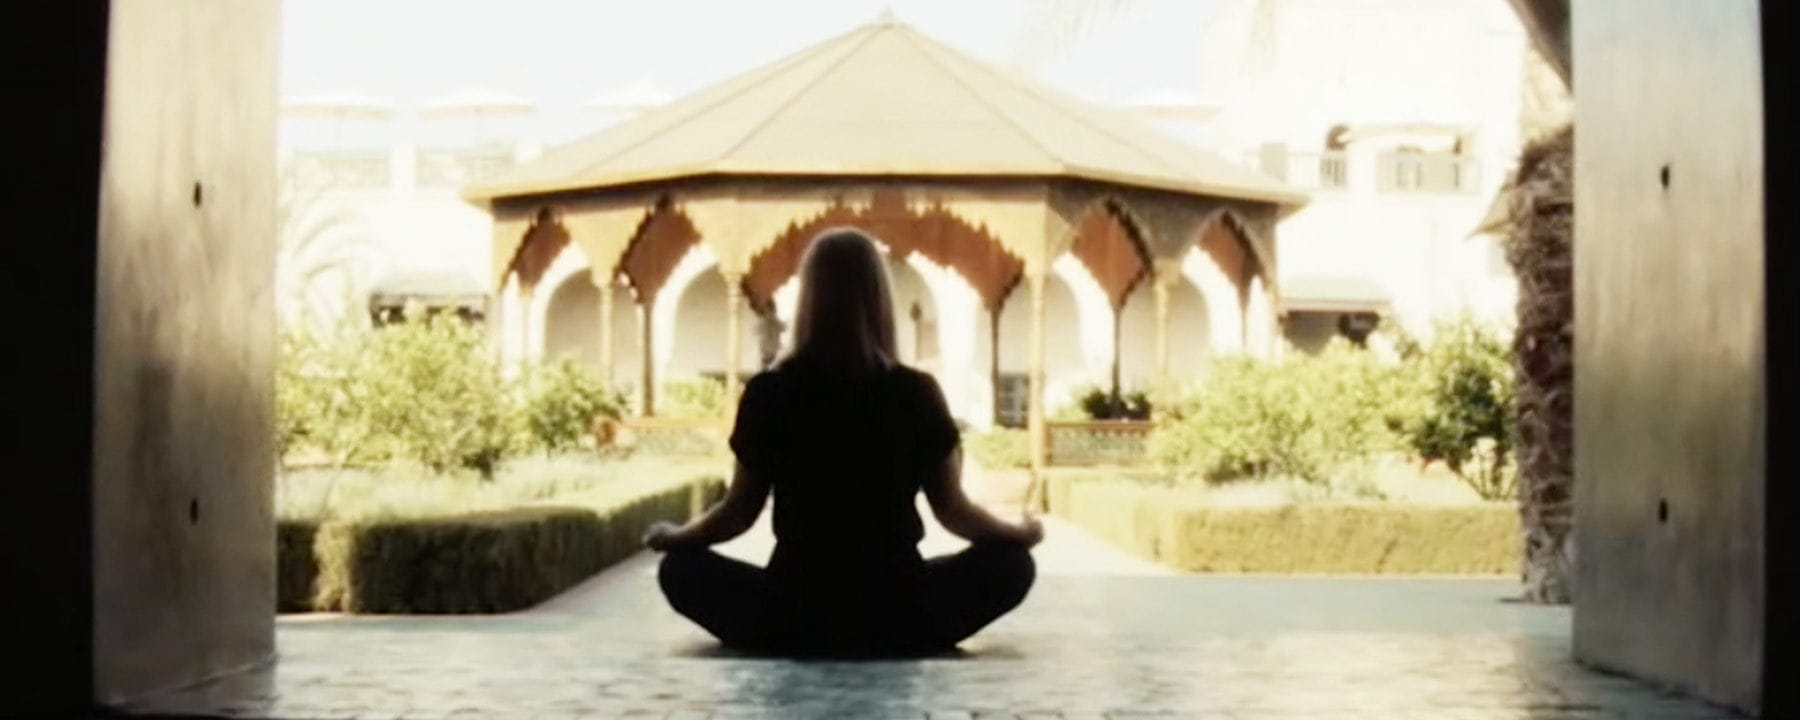 yoga-in-marrakech-jardin-secret_source-nosade